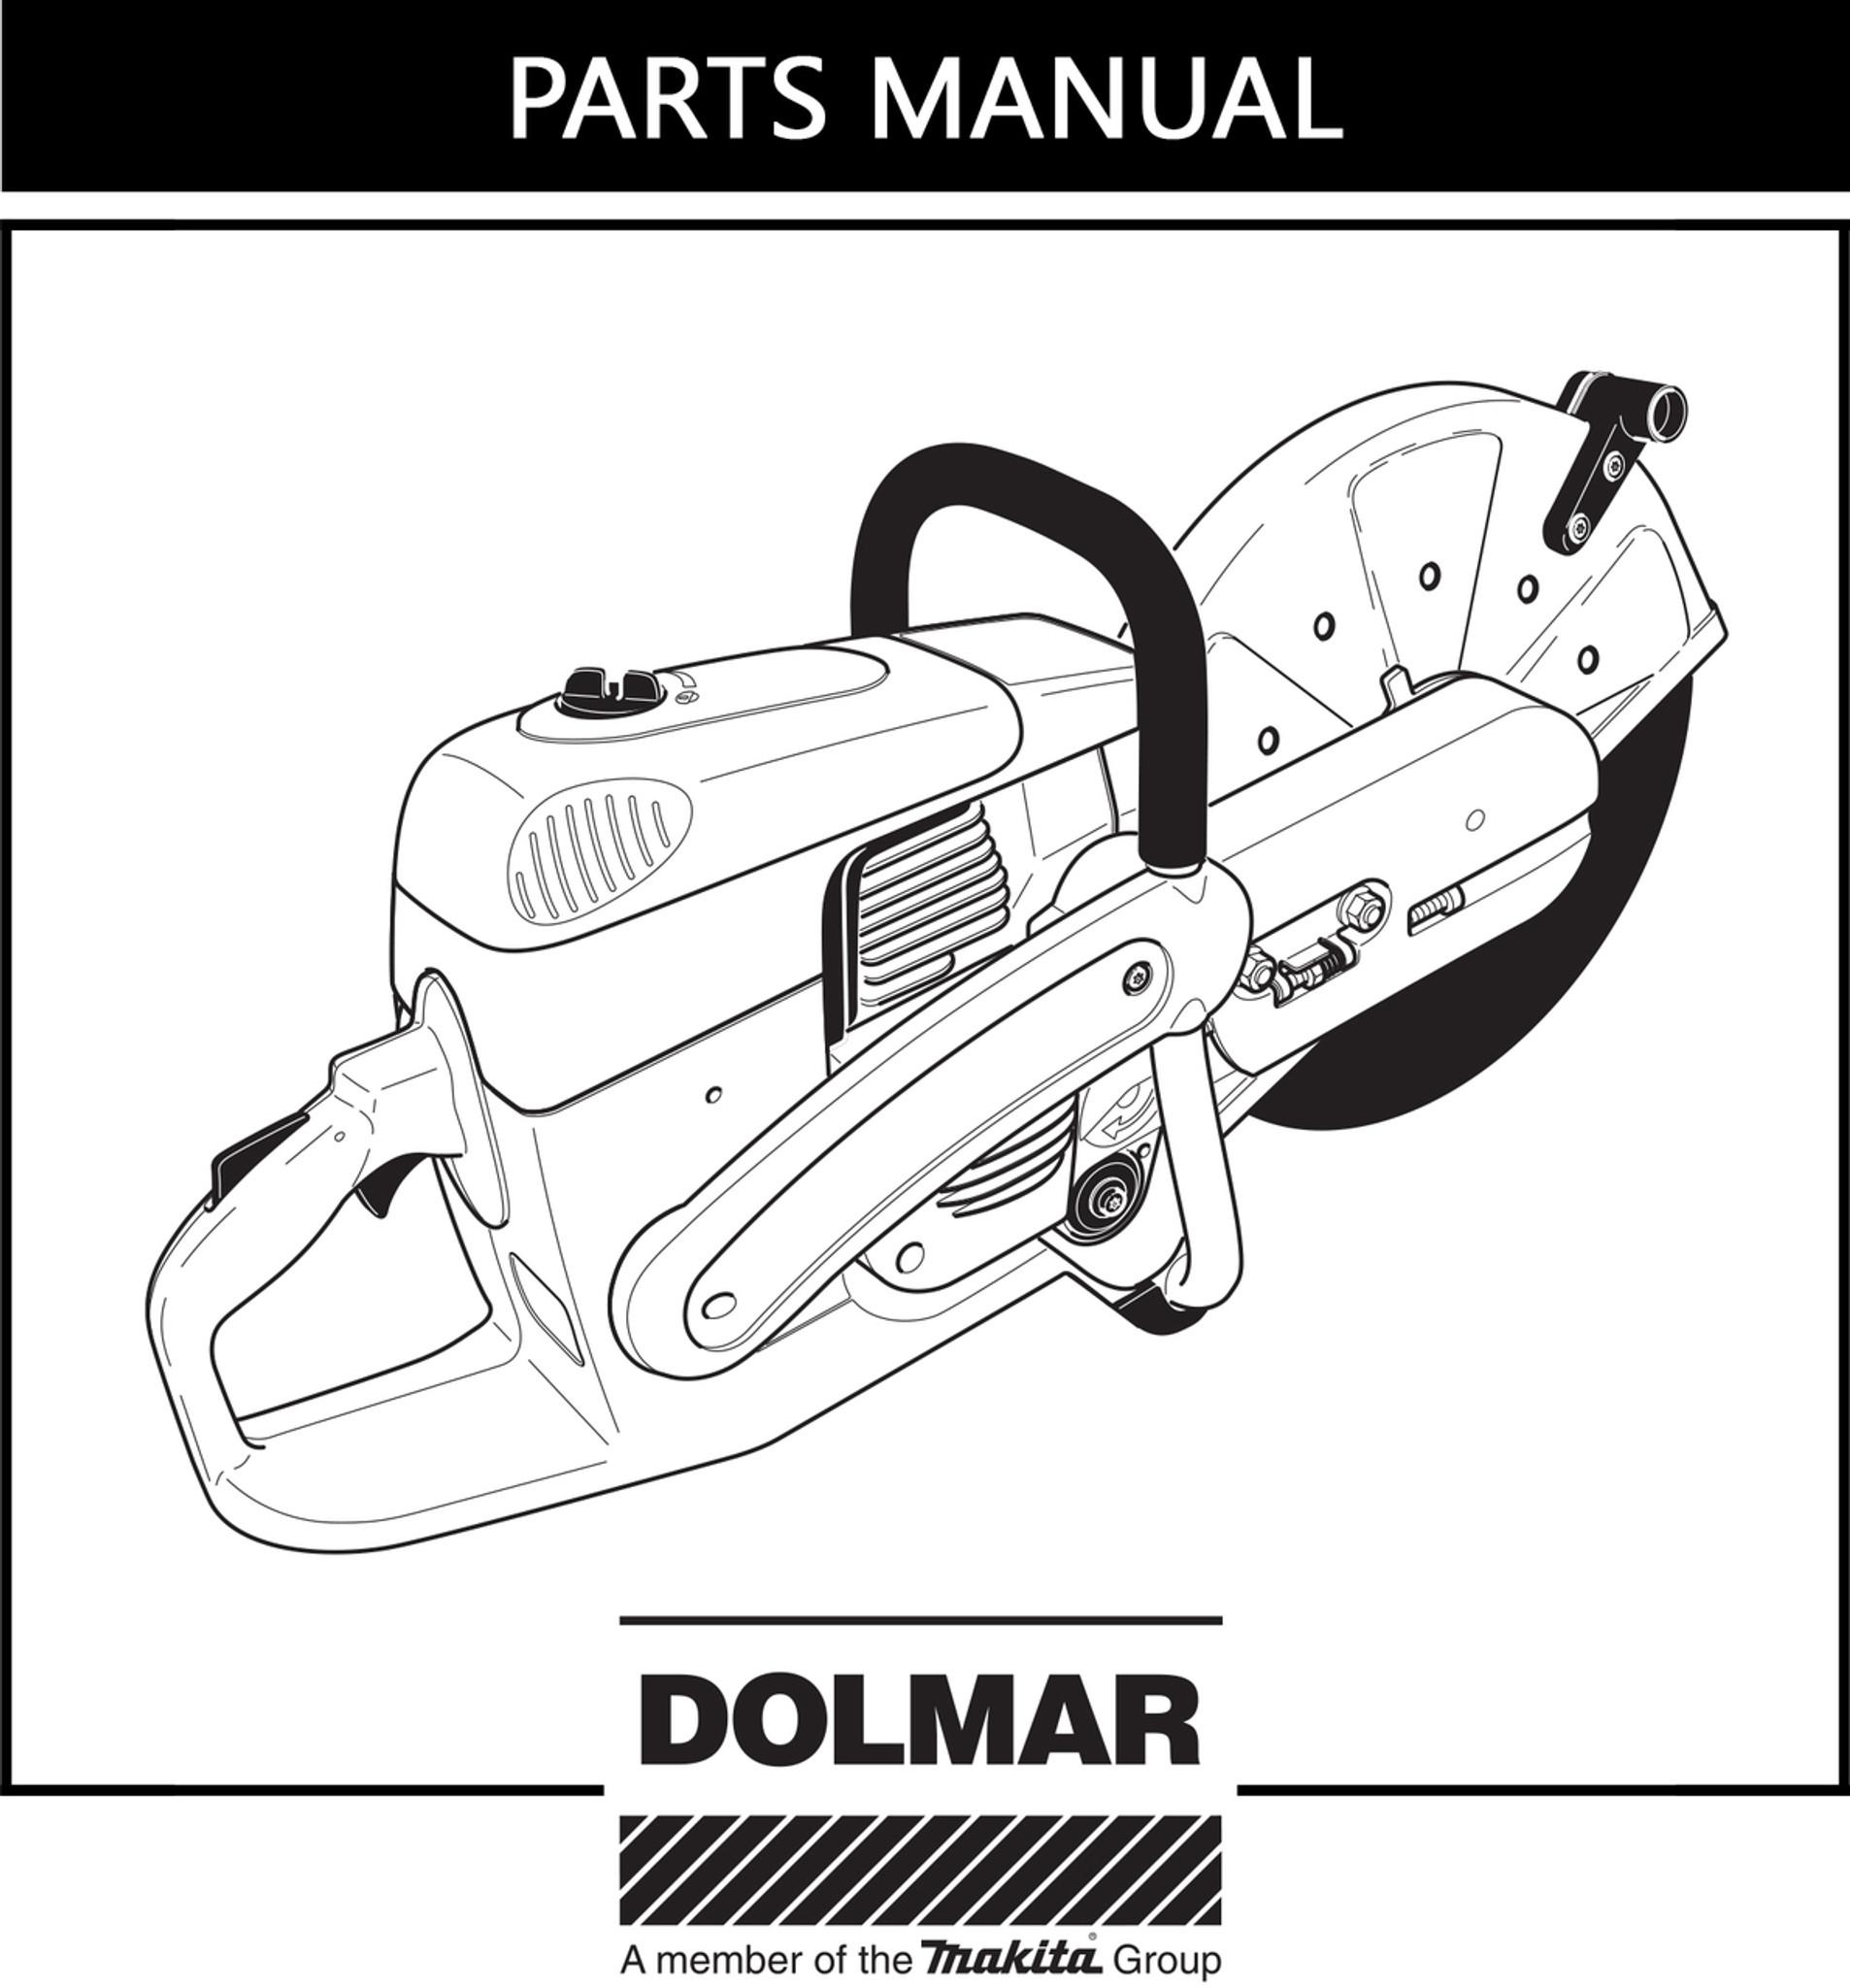 Sachs Dolmar Chainsaw Manual